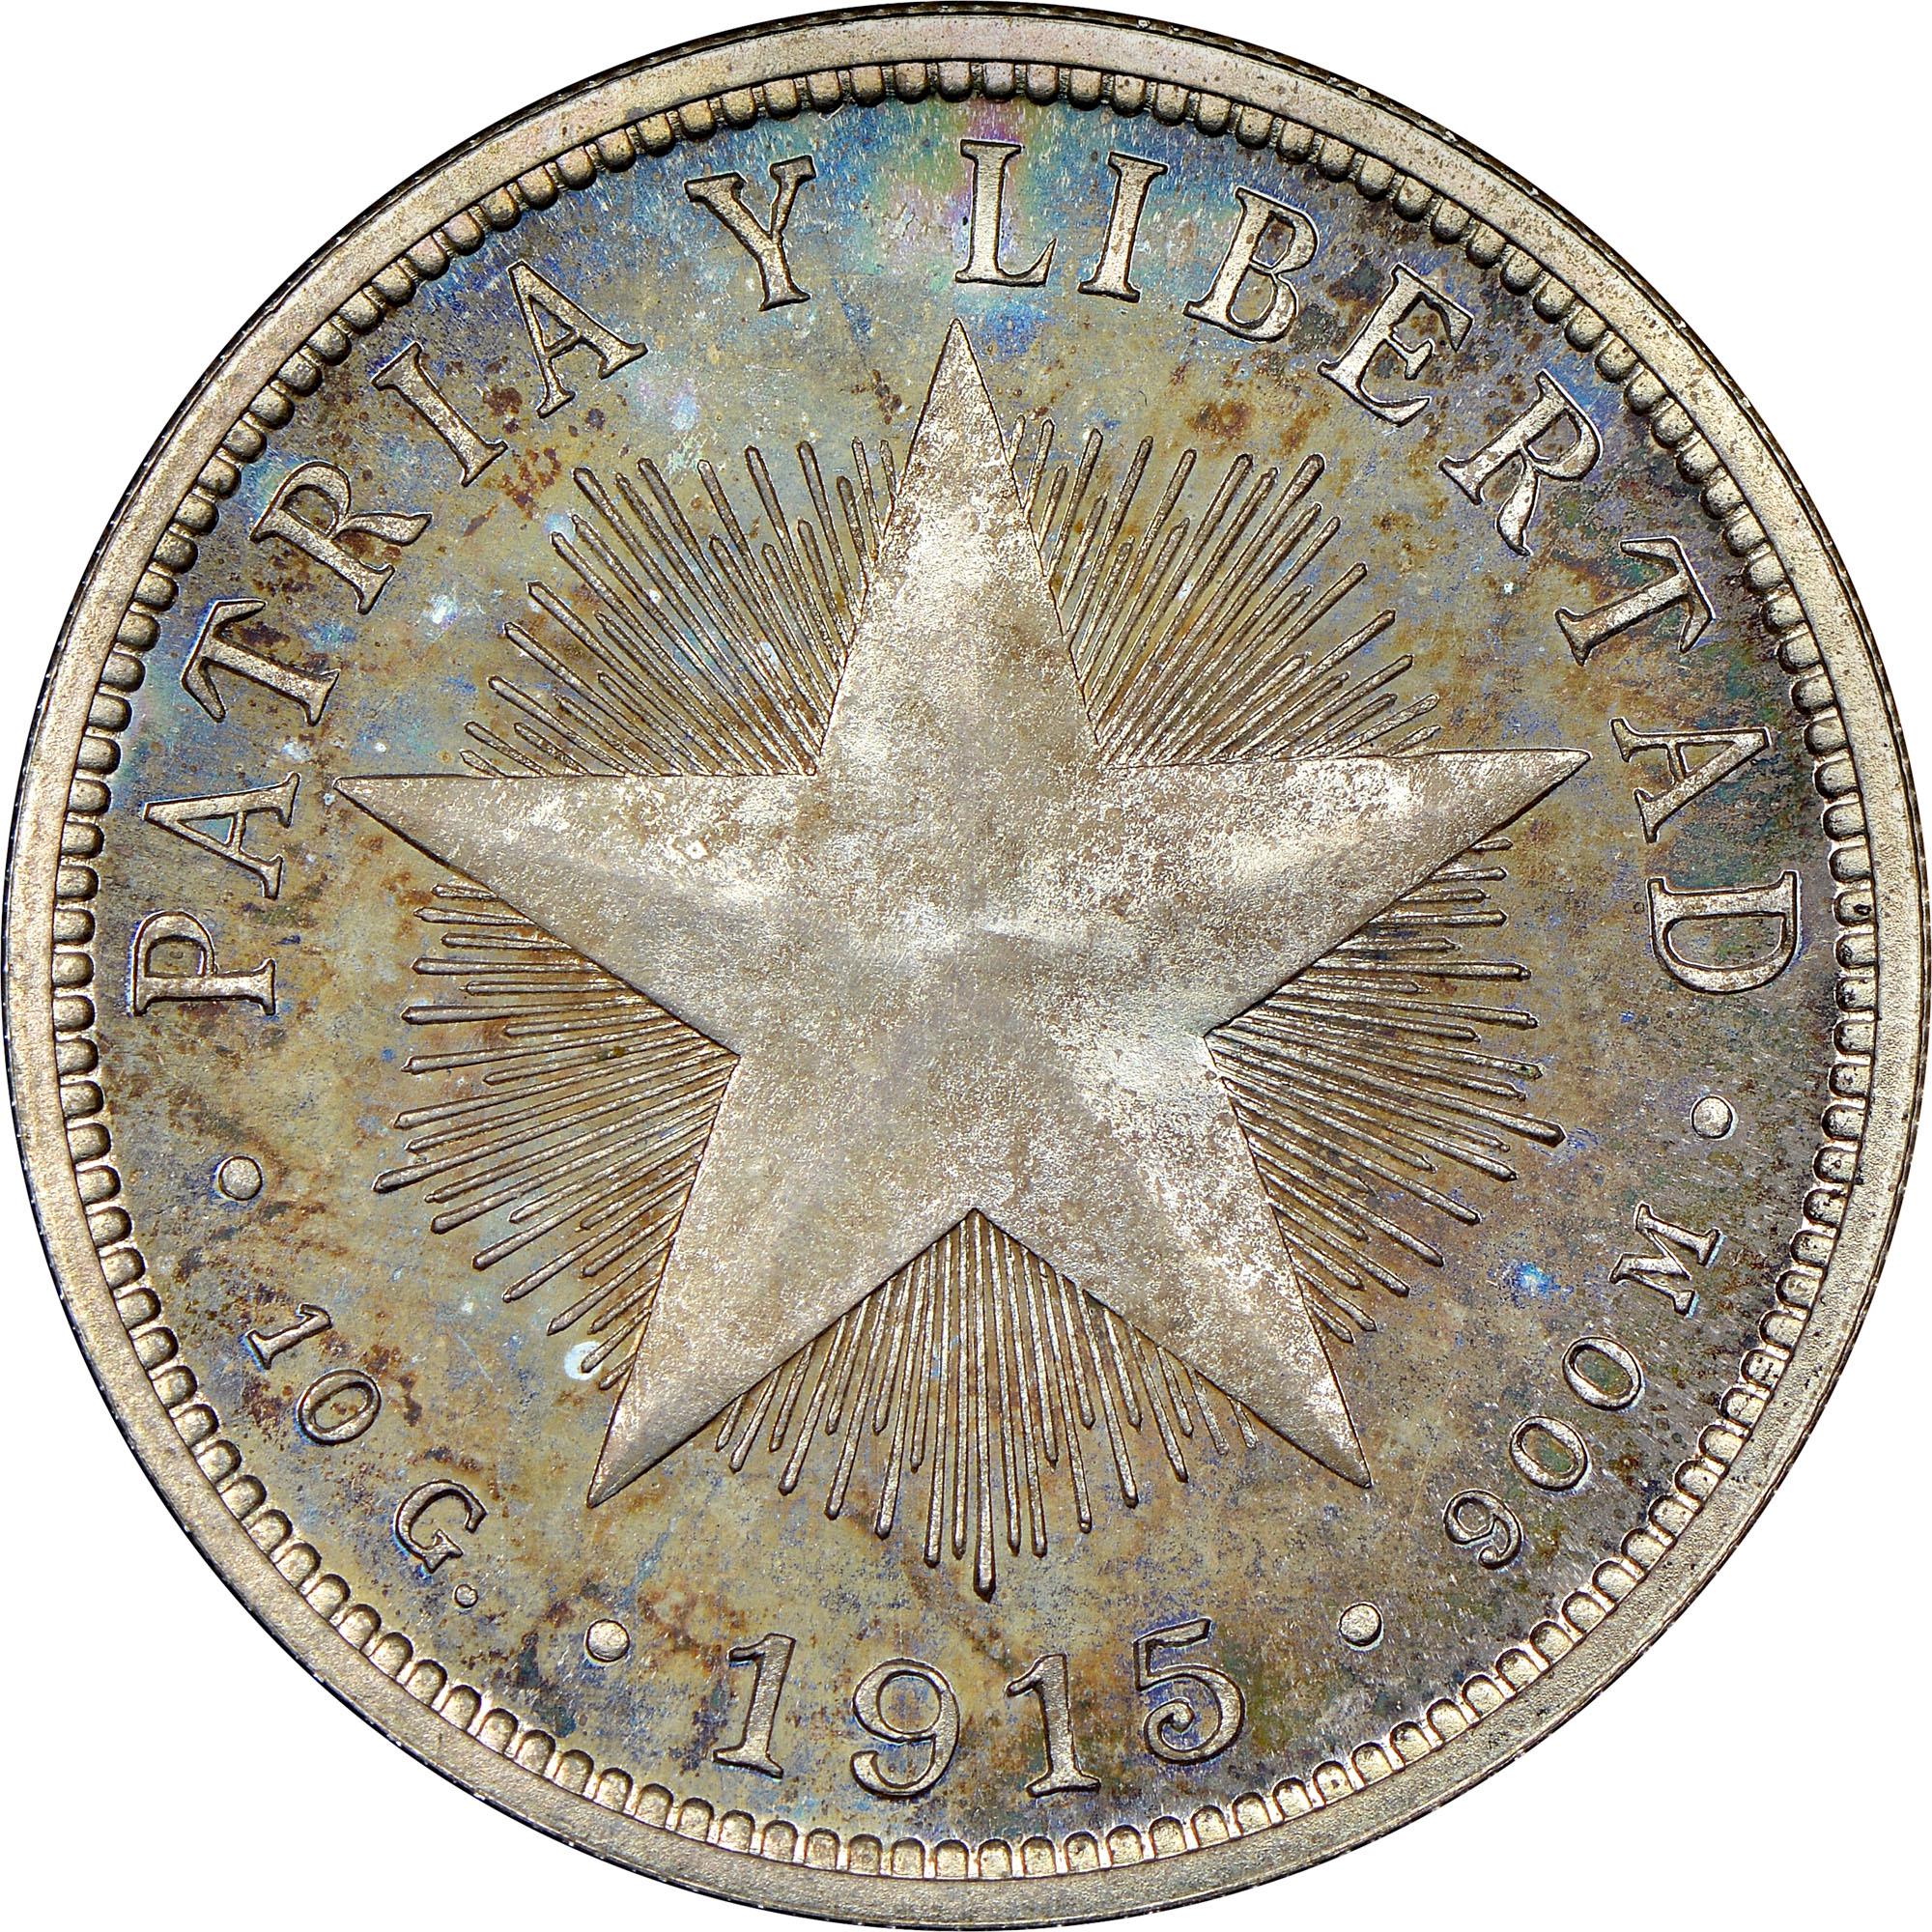 1915-1920 Cuba 40 Centavos reverse